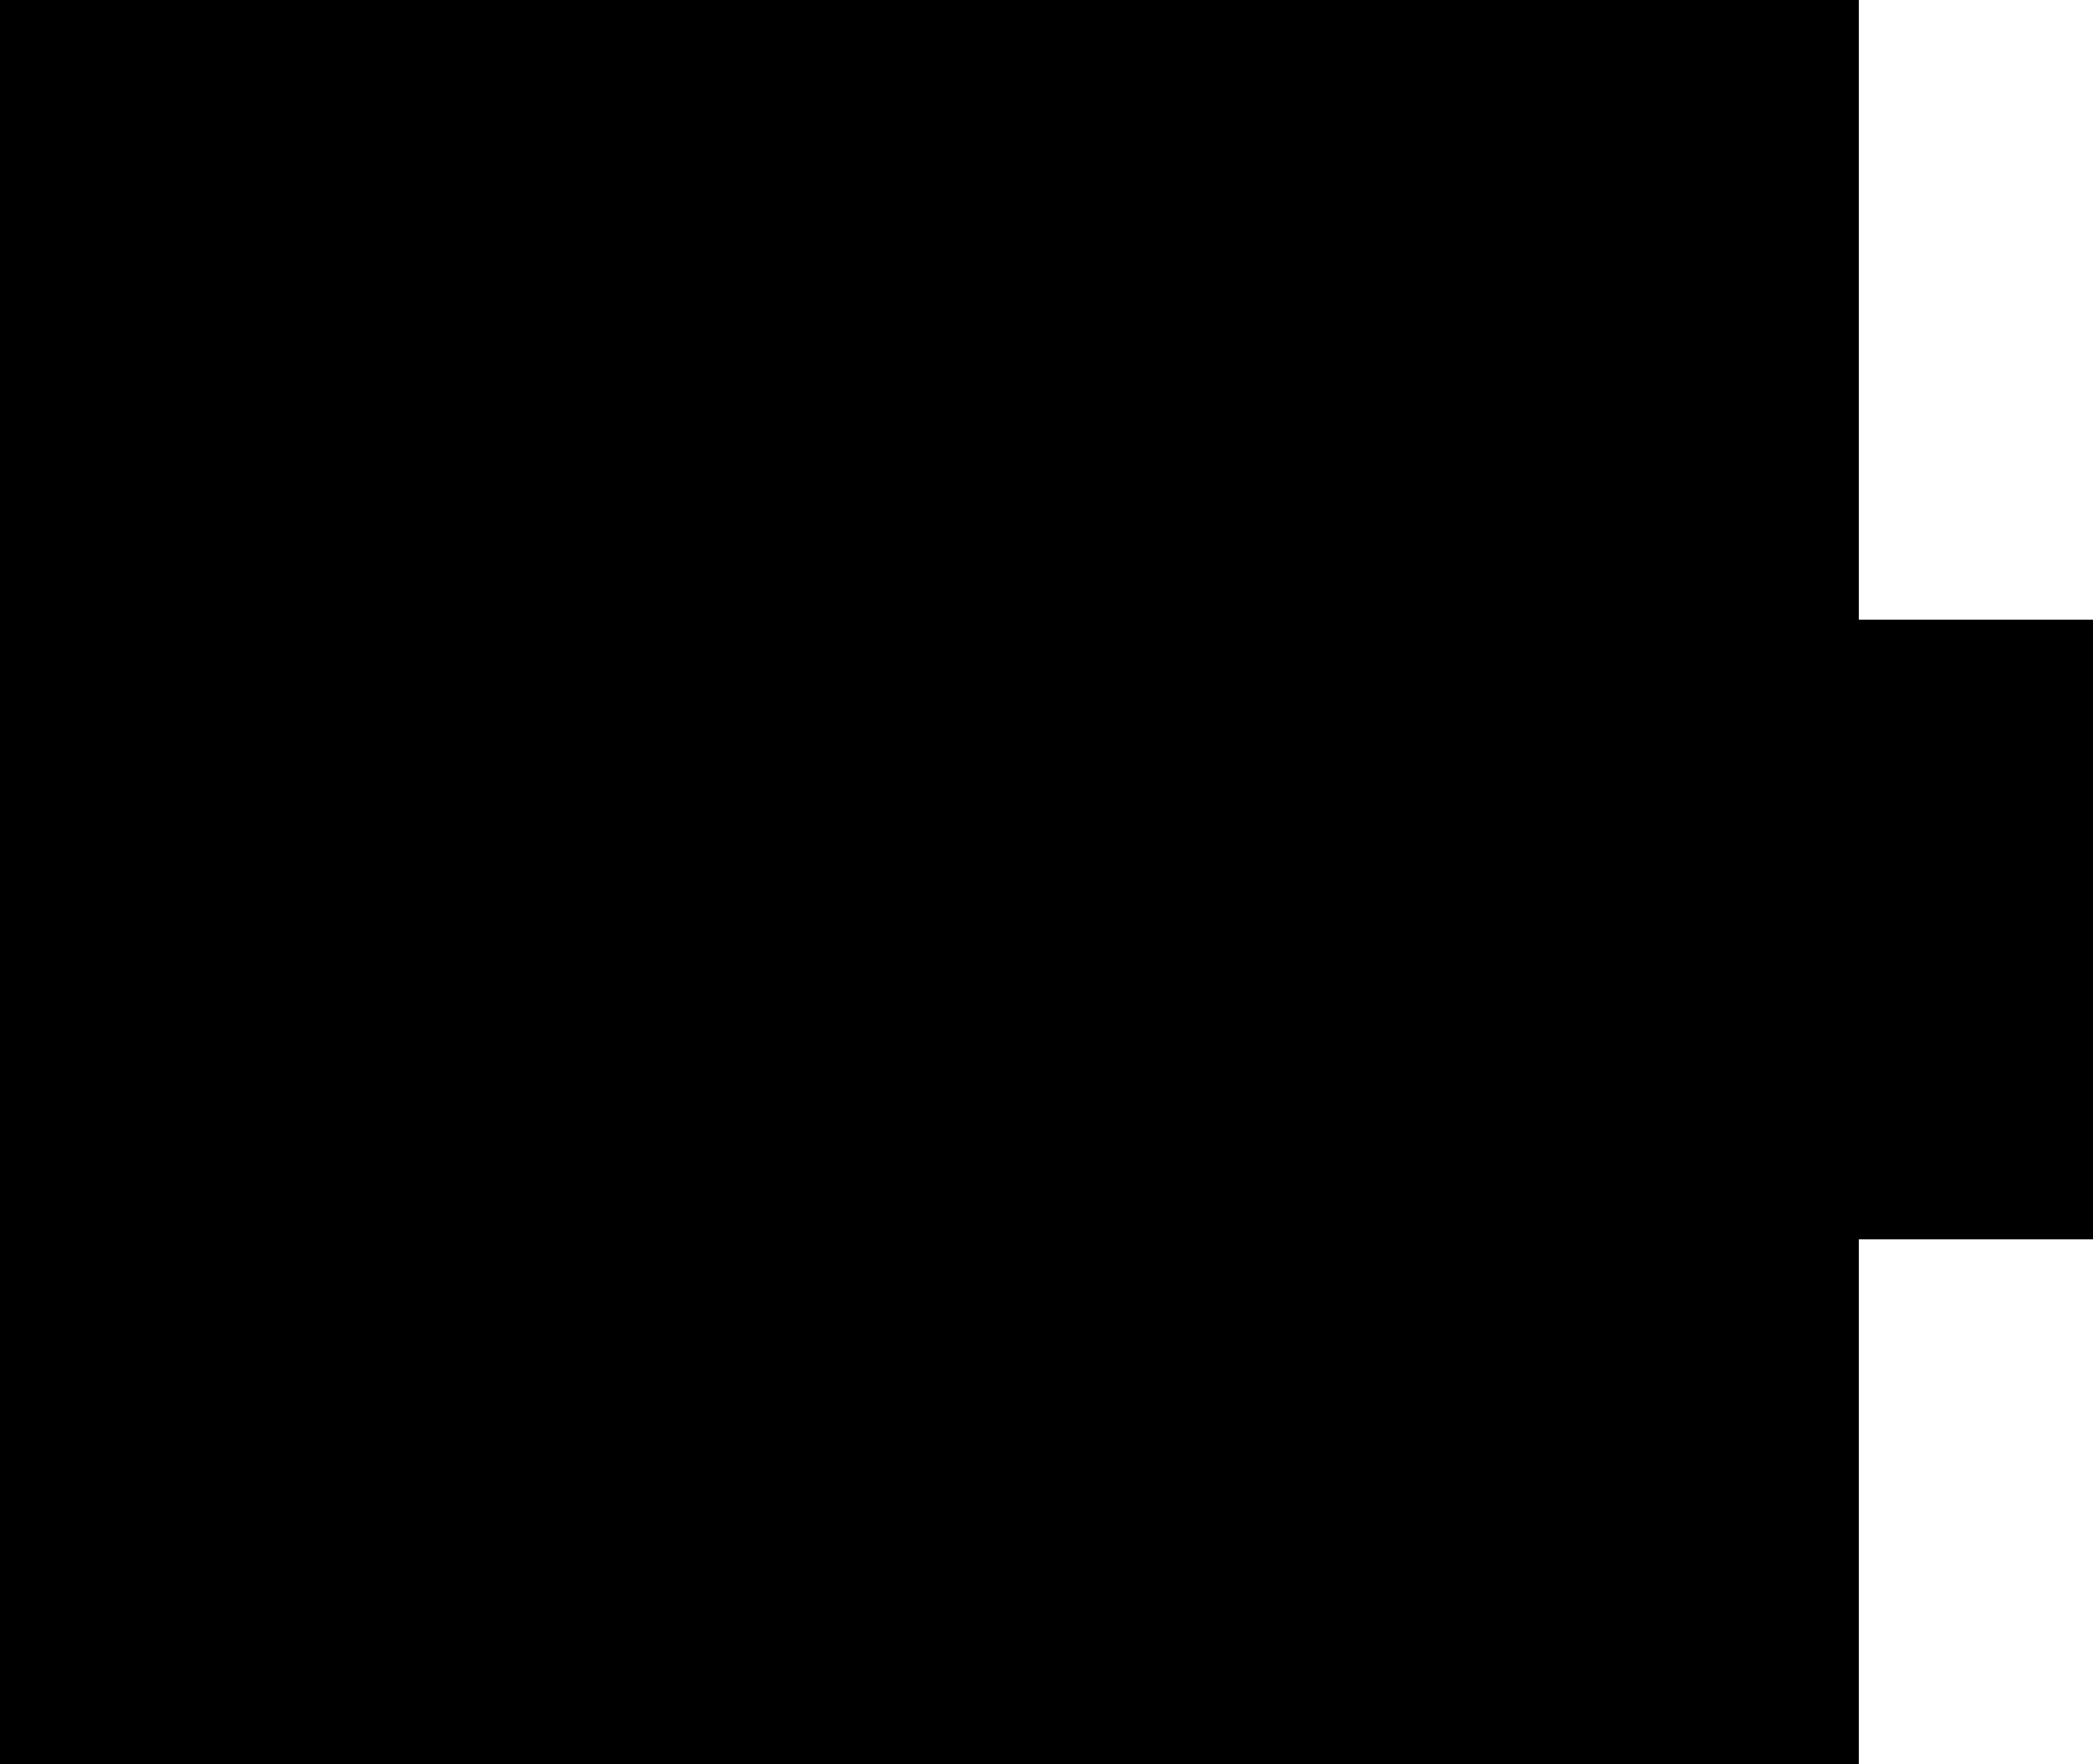 Browngirl magazine logo